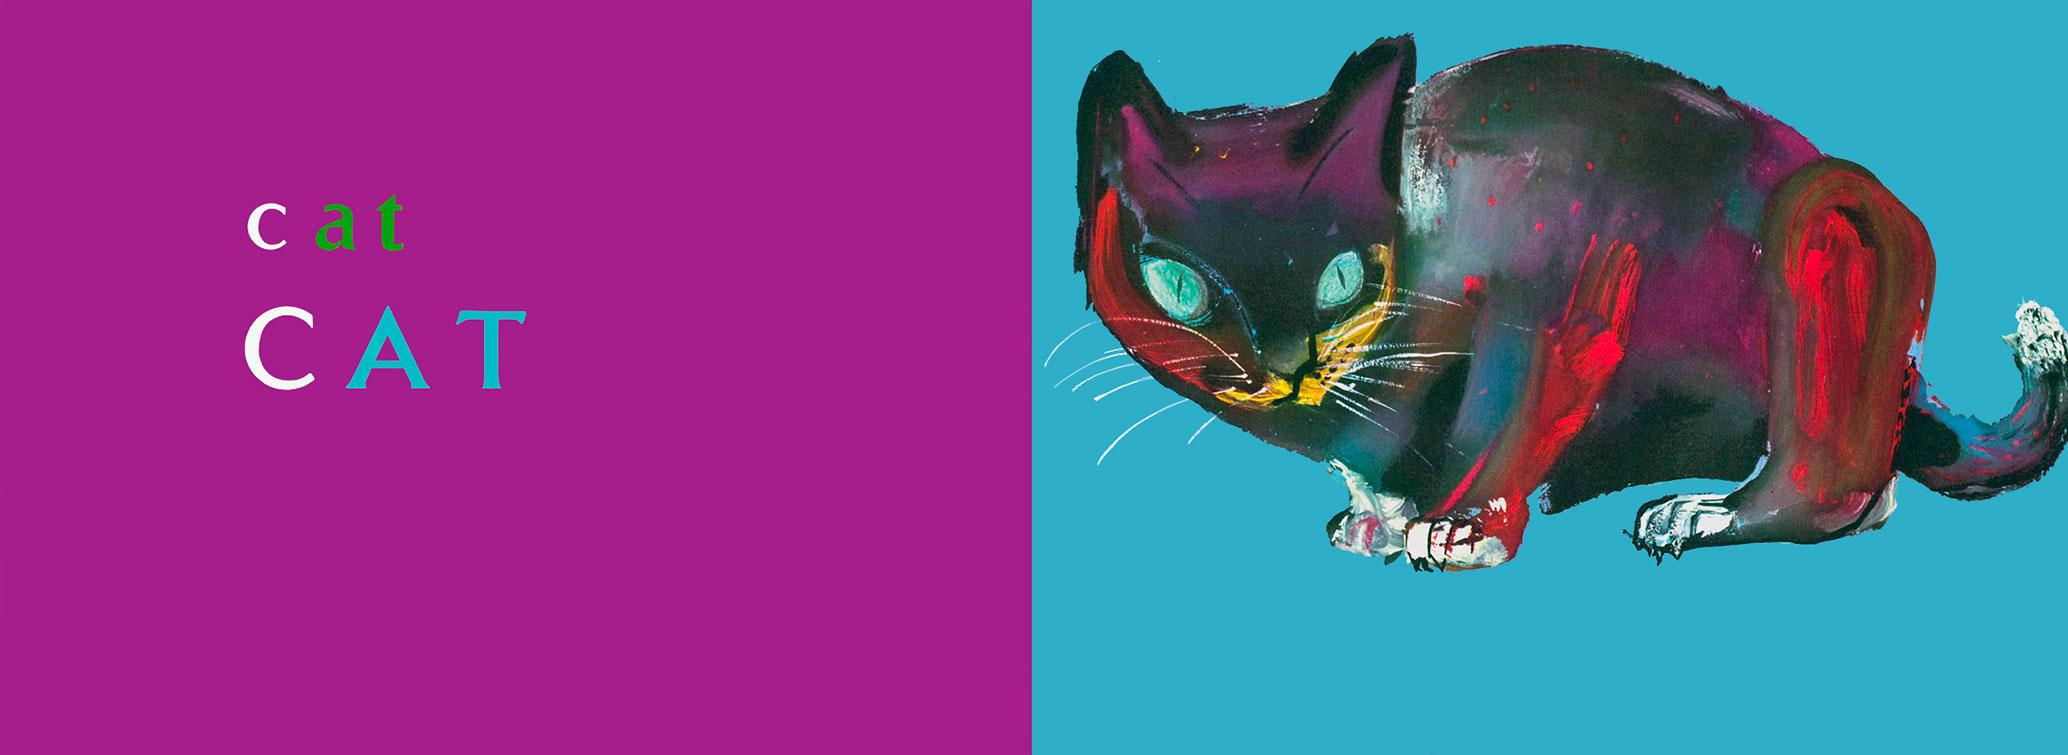 c-for-cat-brian-wildsmith-ABC.jpg